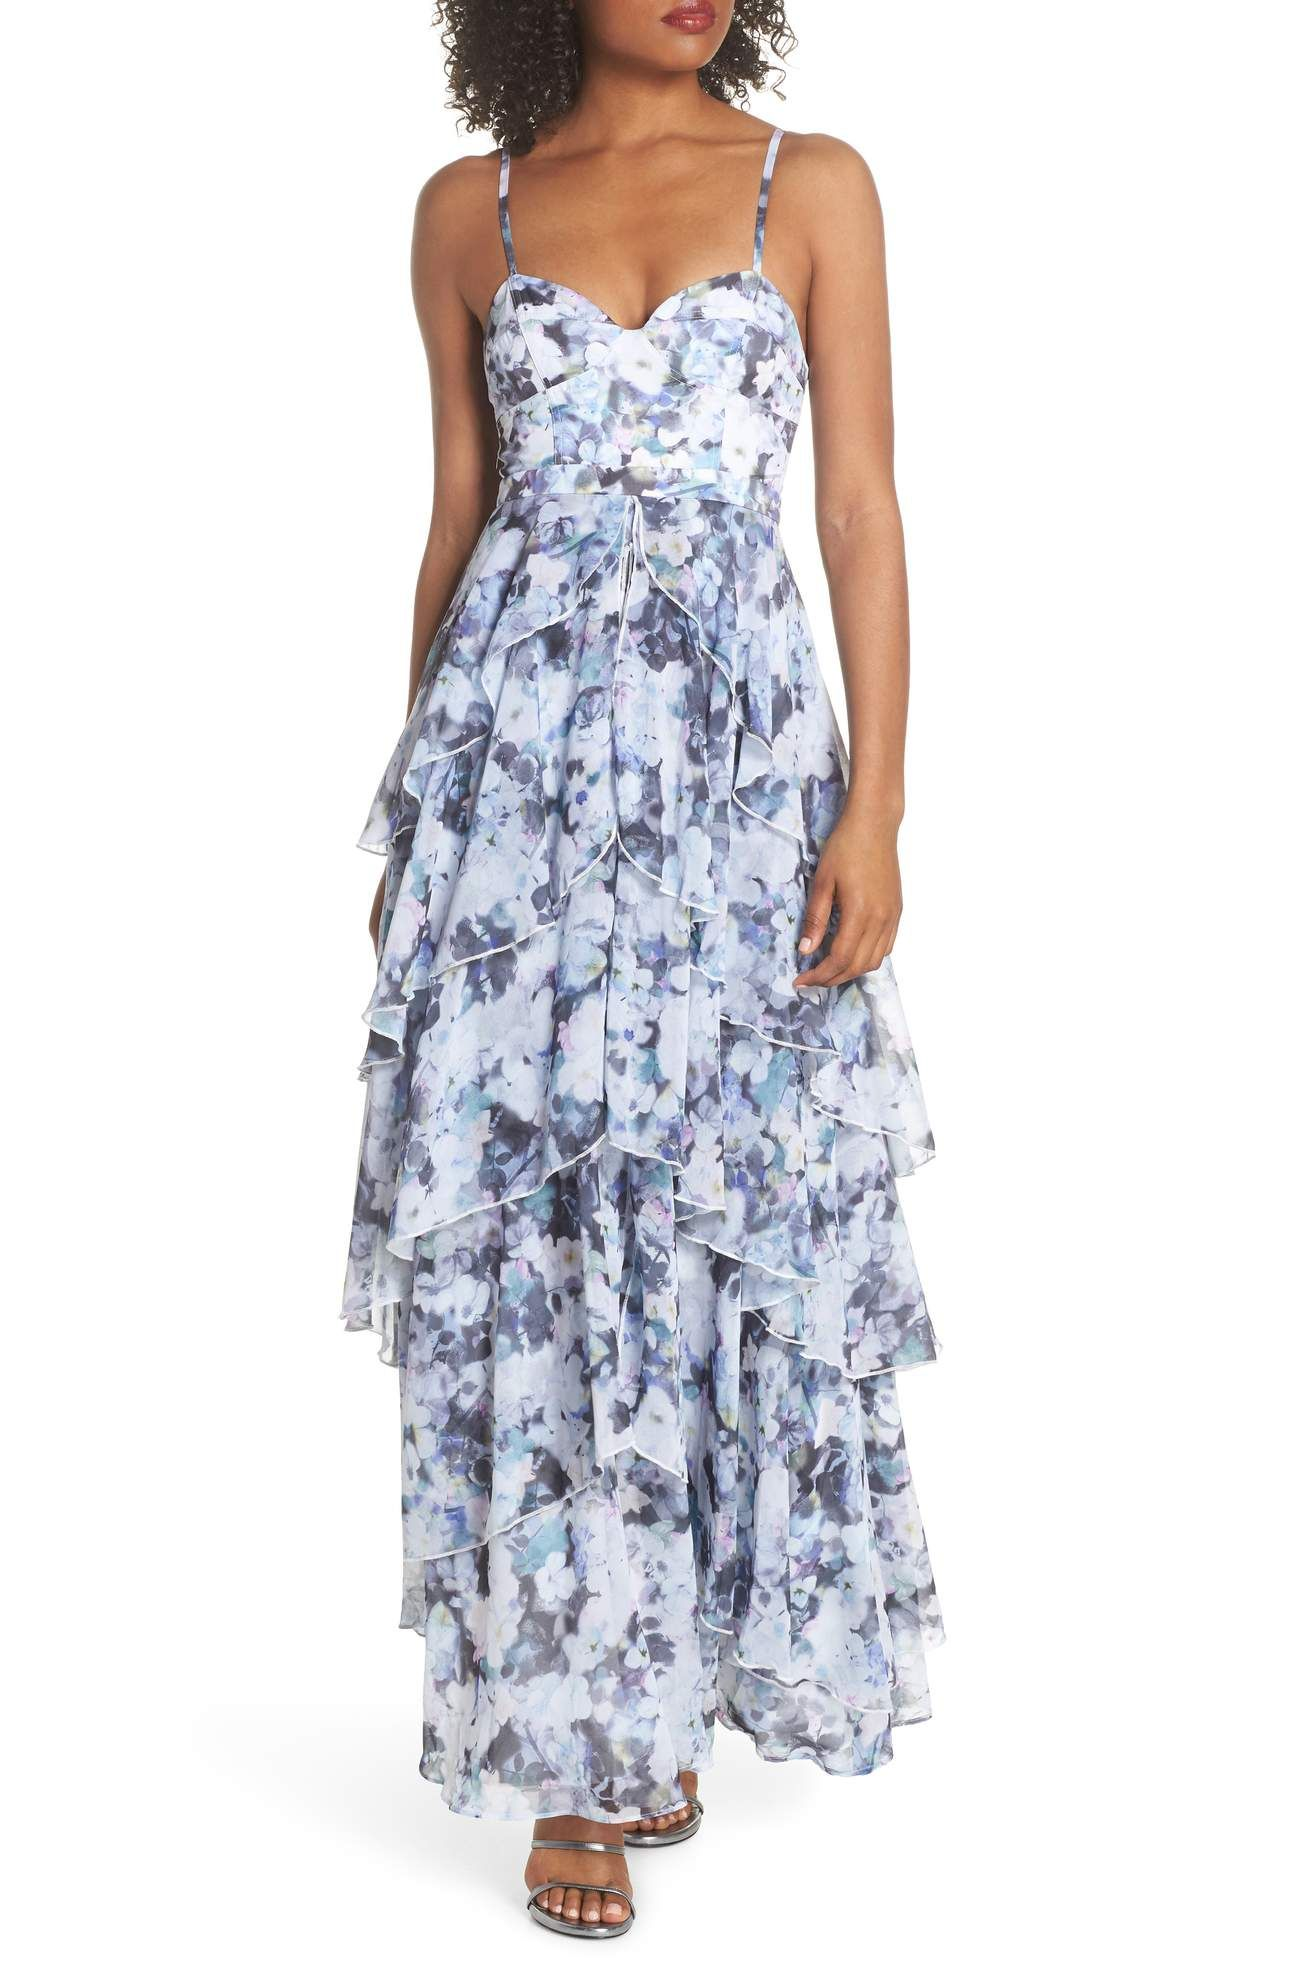 49b4039093b Product Image 1 Bridesmaid Dresses Floral Print